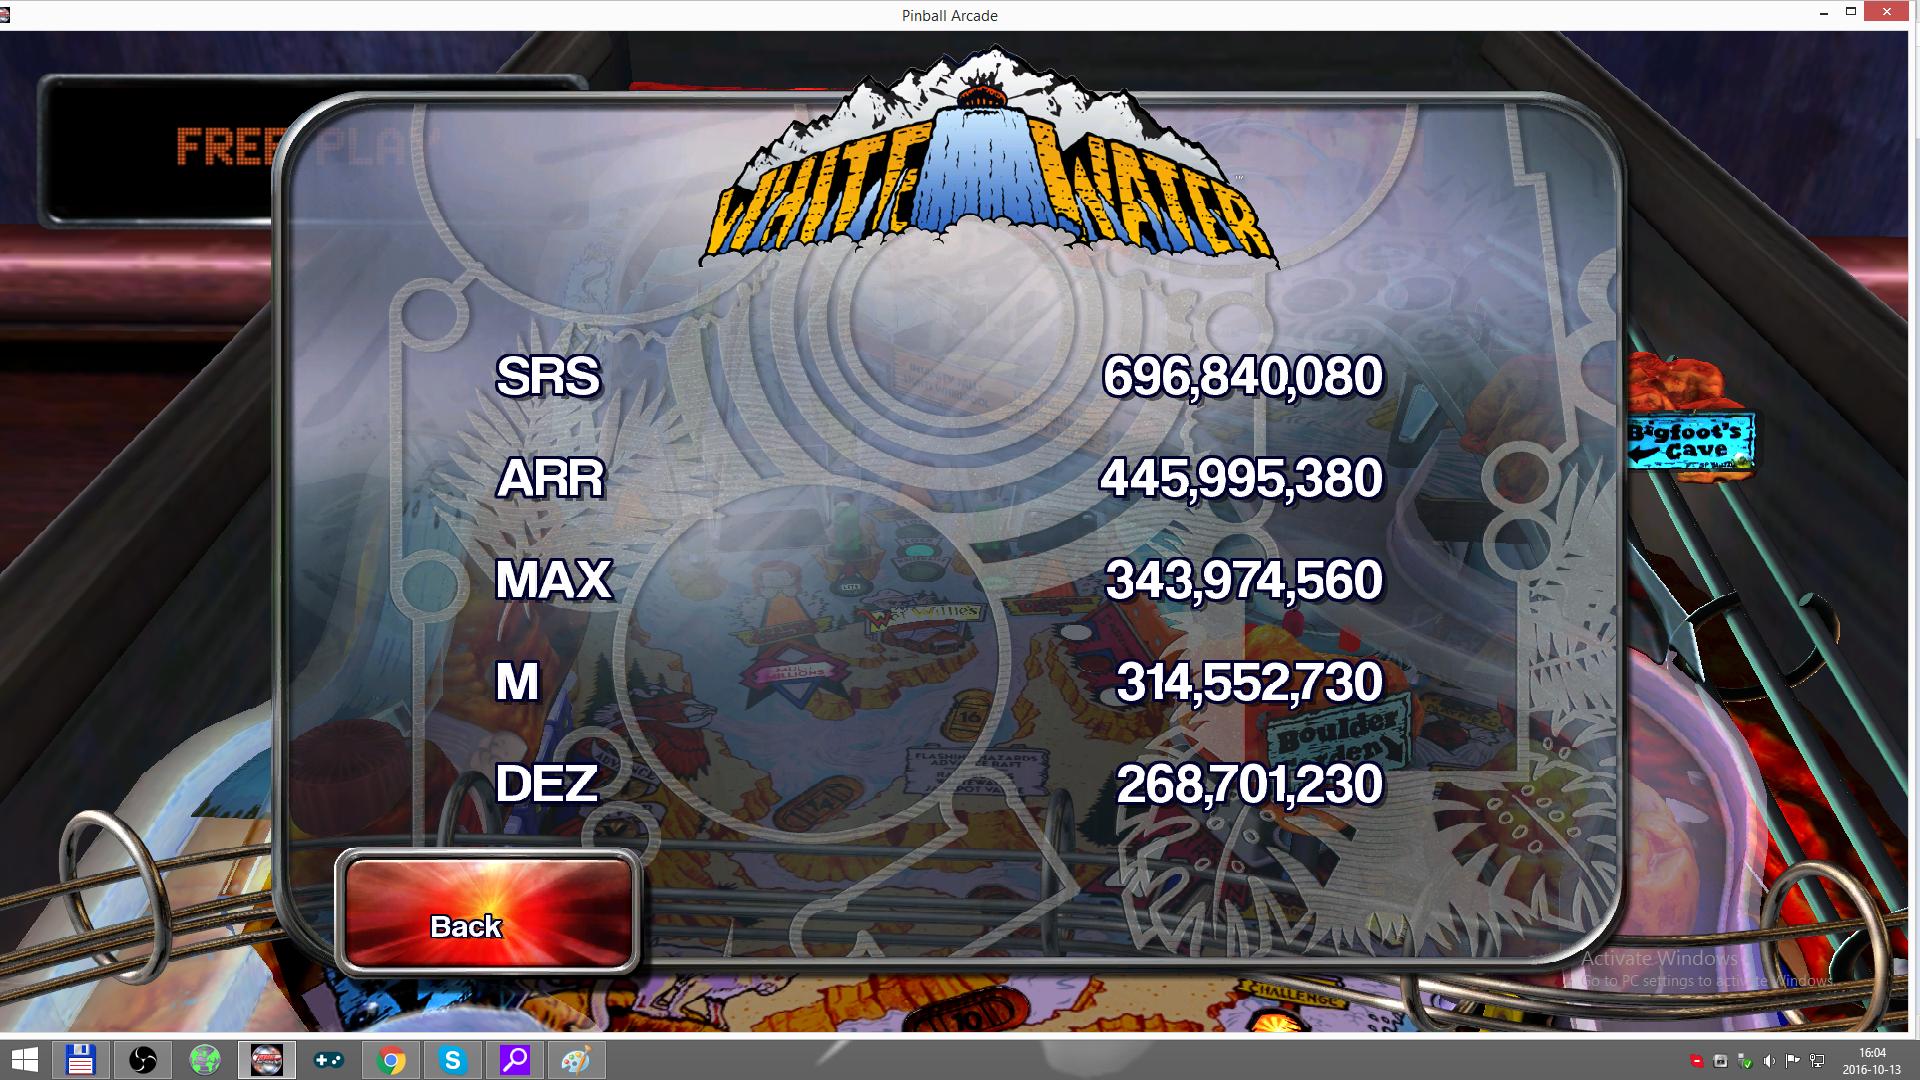 Pinball Arcade: White Water 343,974,560 points